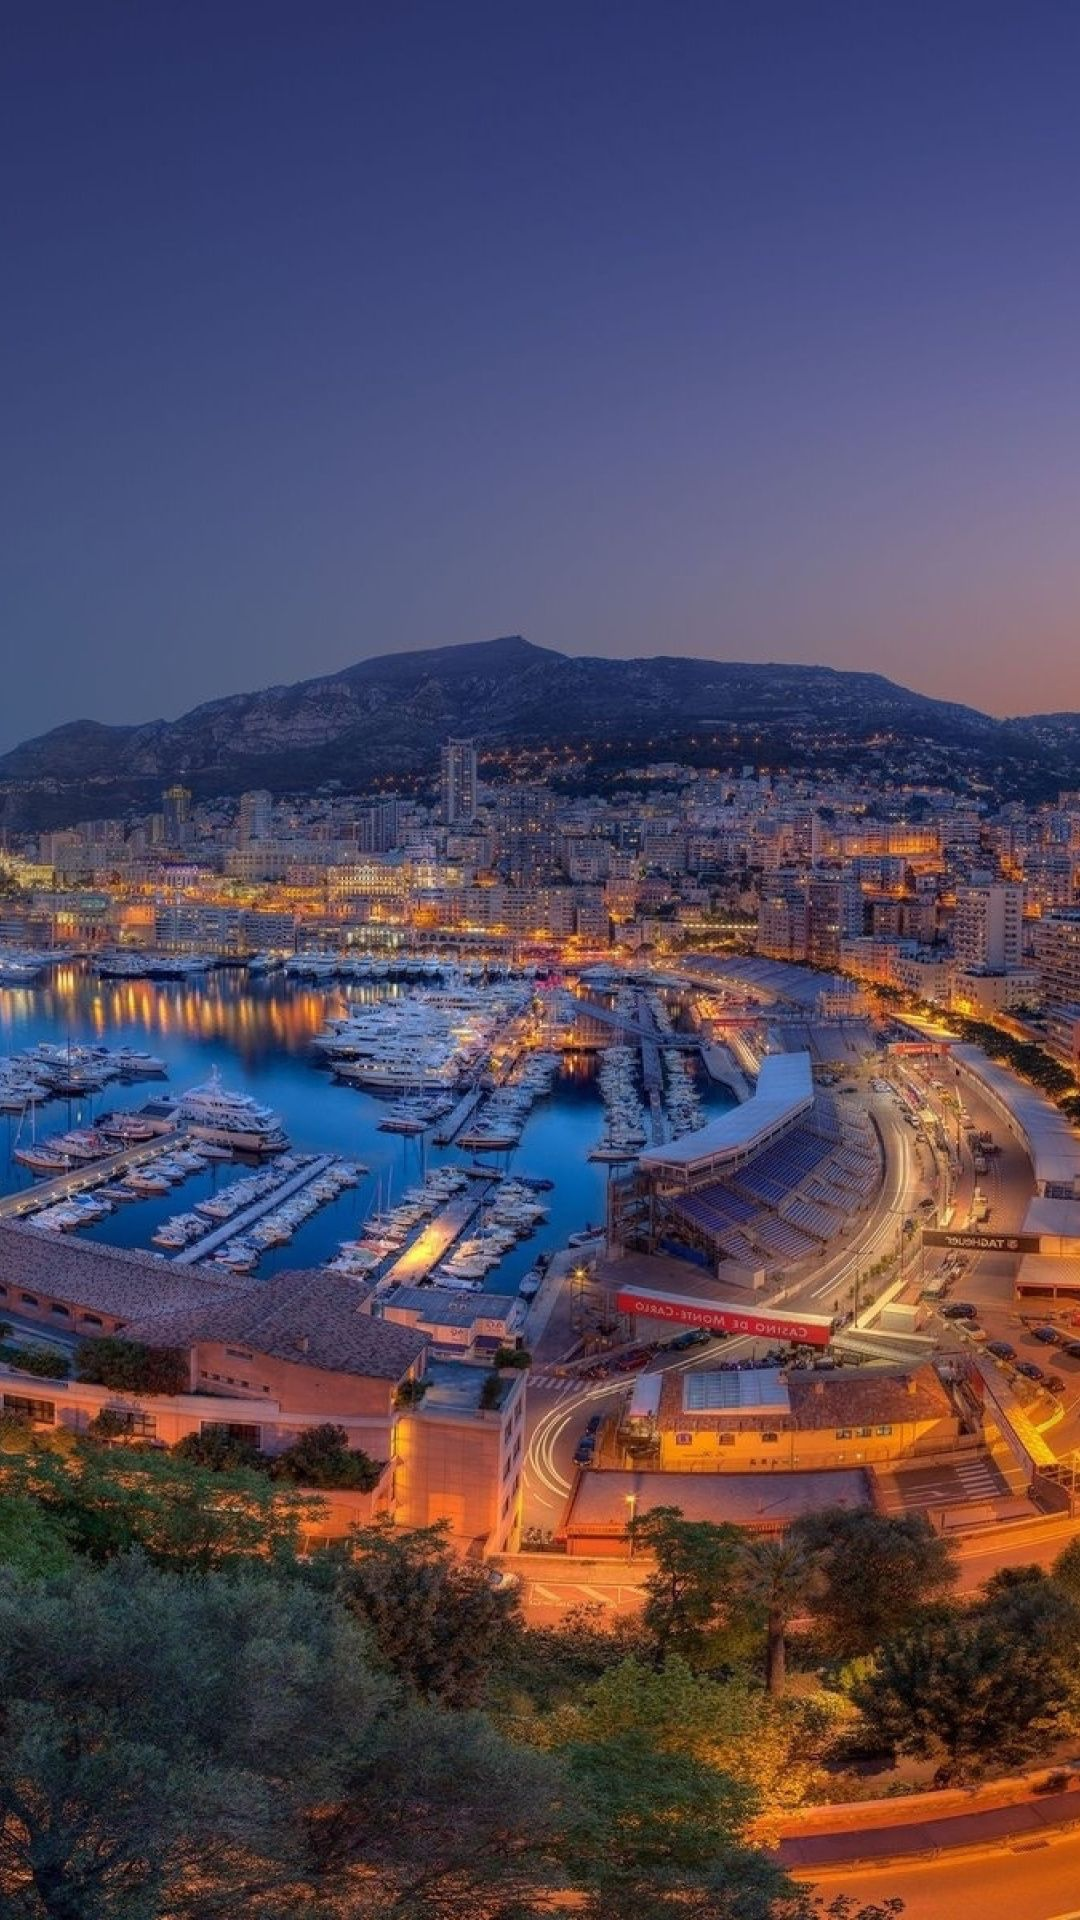 Monte Carlo Wallpaper For Phone And Desktop